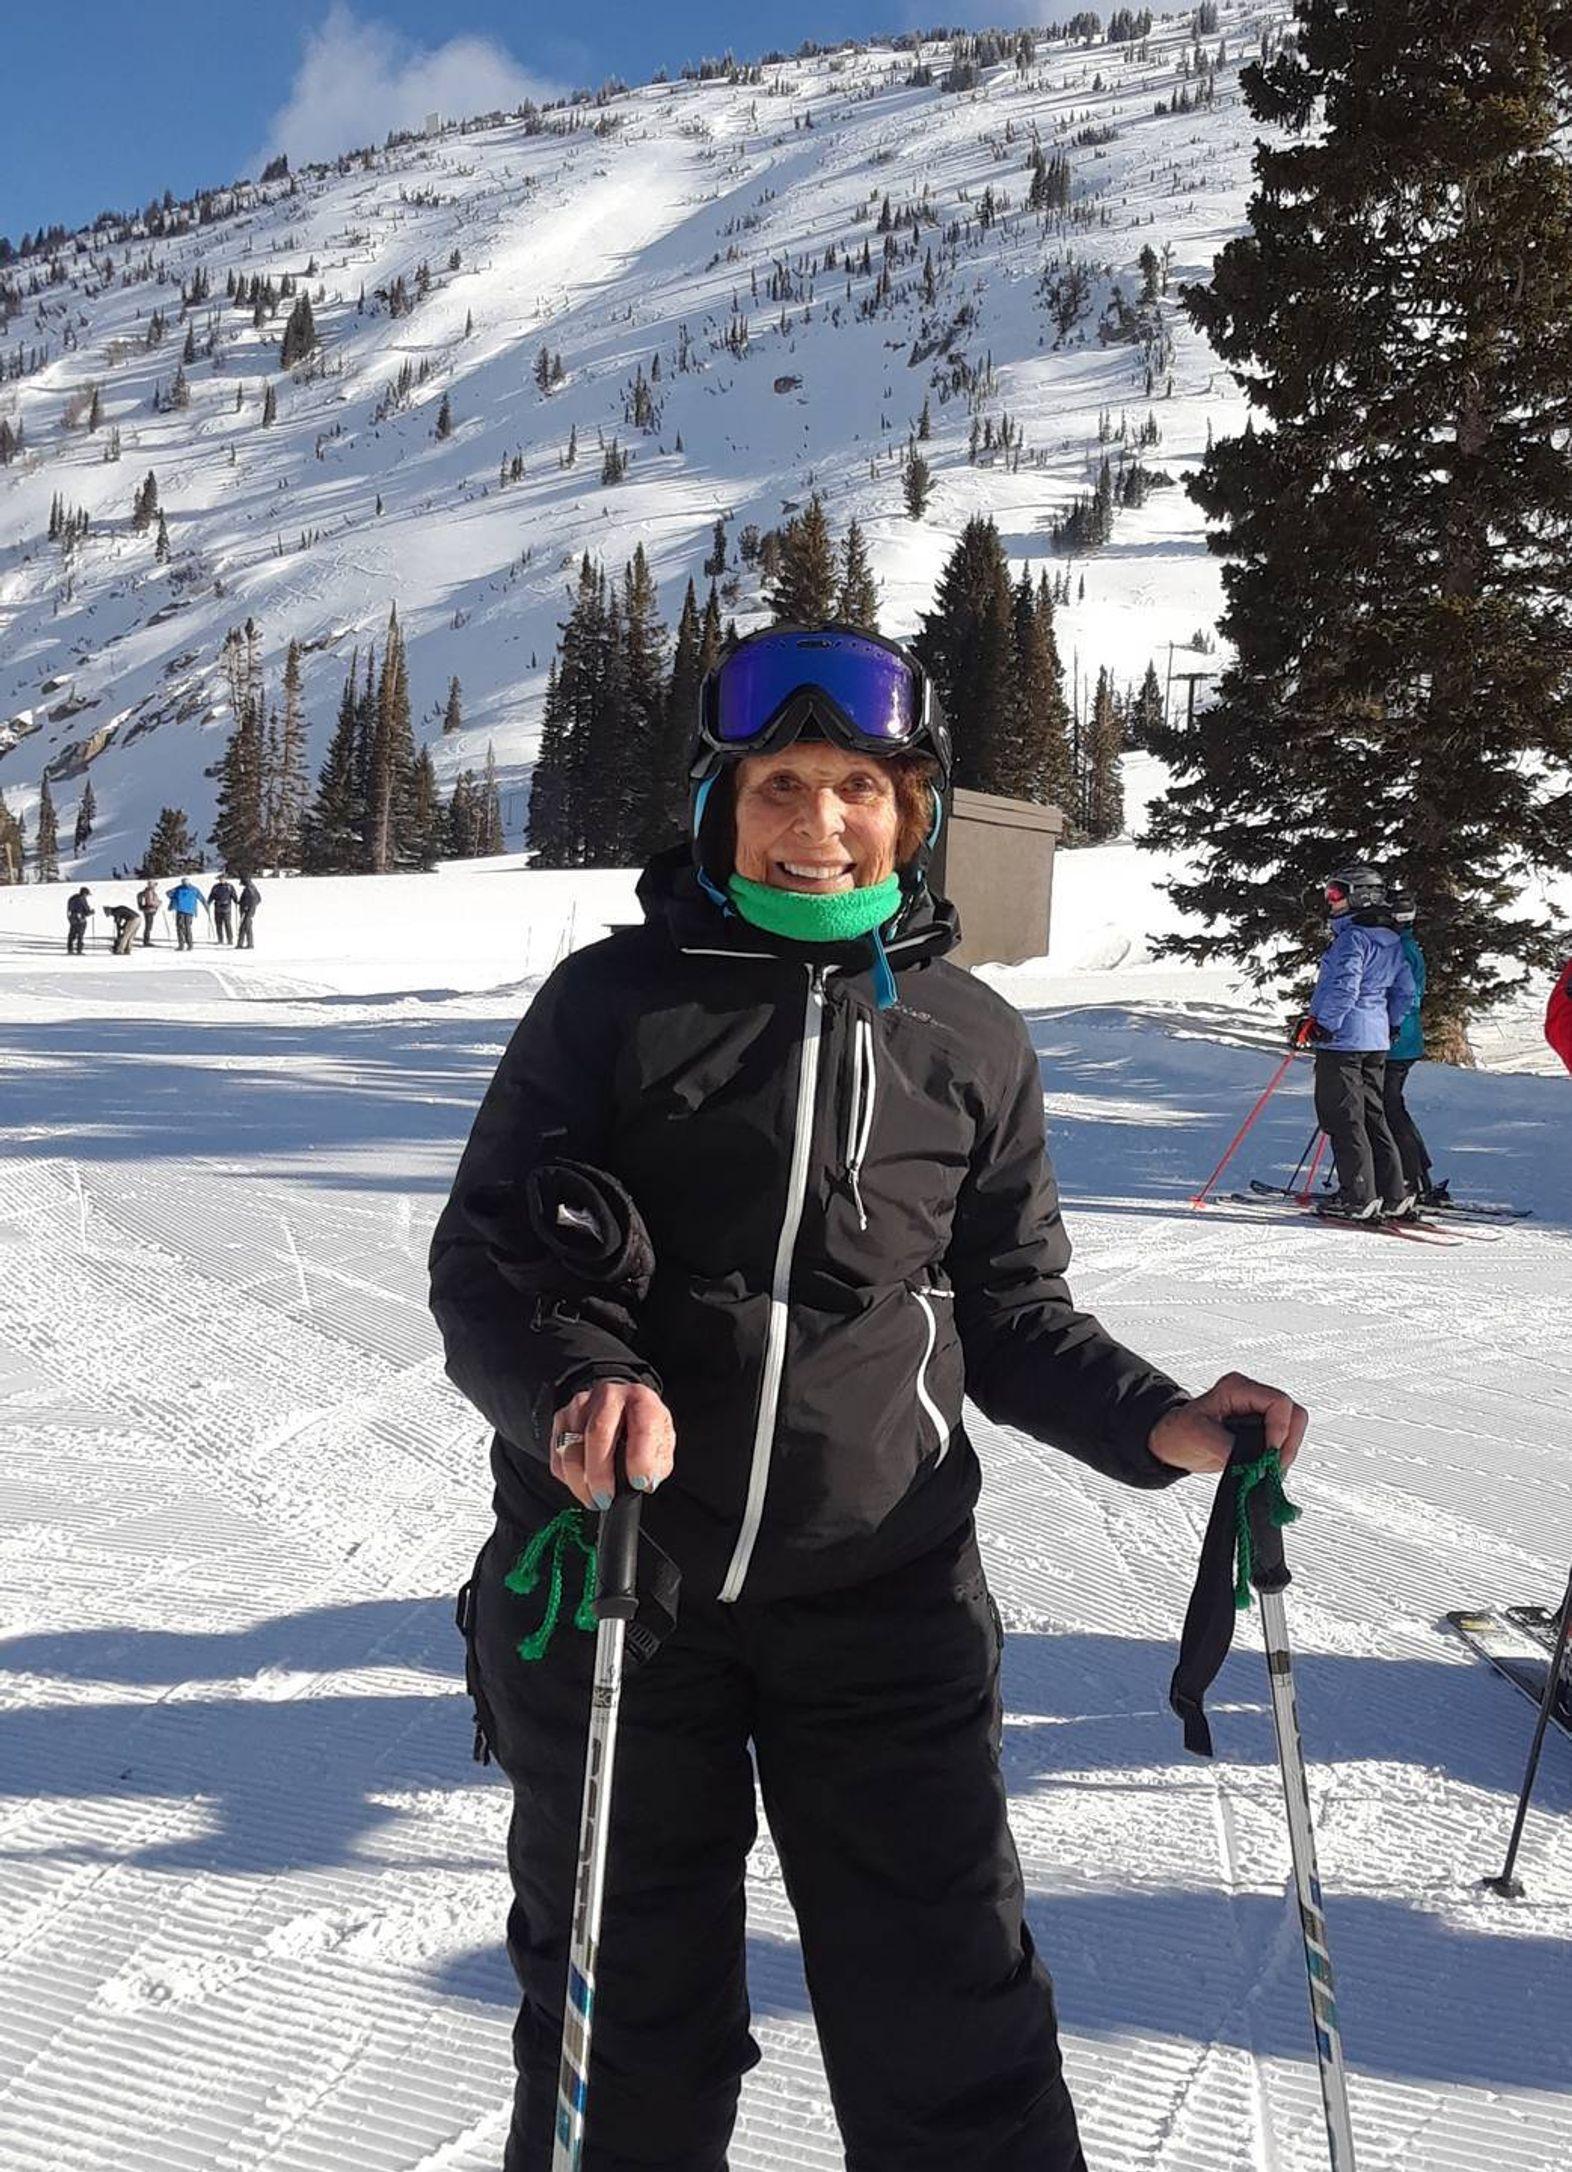 Eileen Fishkin of Marlborough, N.J., an avid downhill skier, Next Avenue, embrace joys of winter